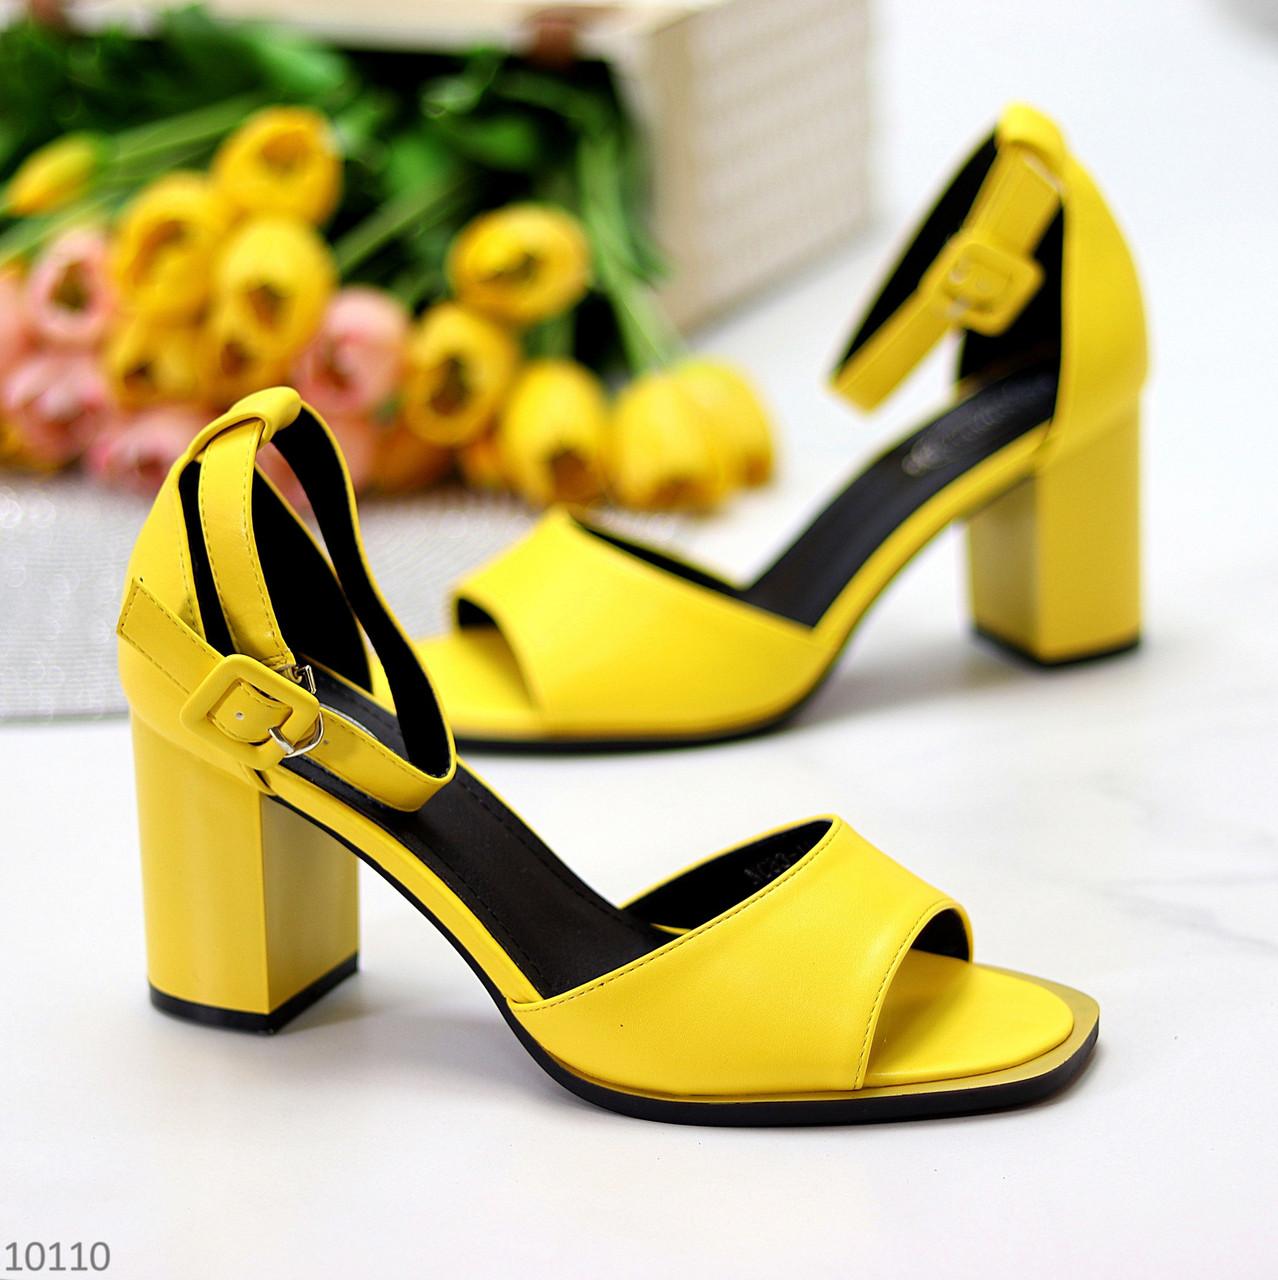 Модельные желтые женские босоножки на ремешке шлейке на устойчивом каблуке